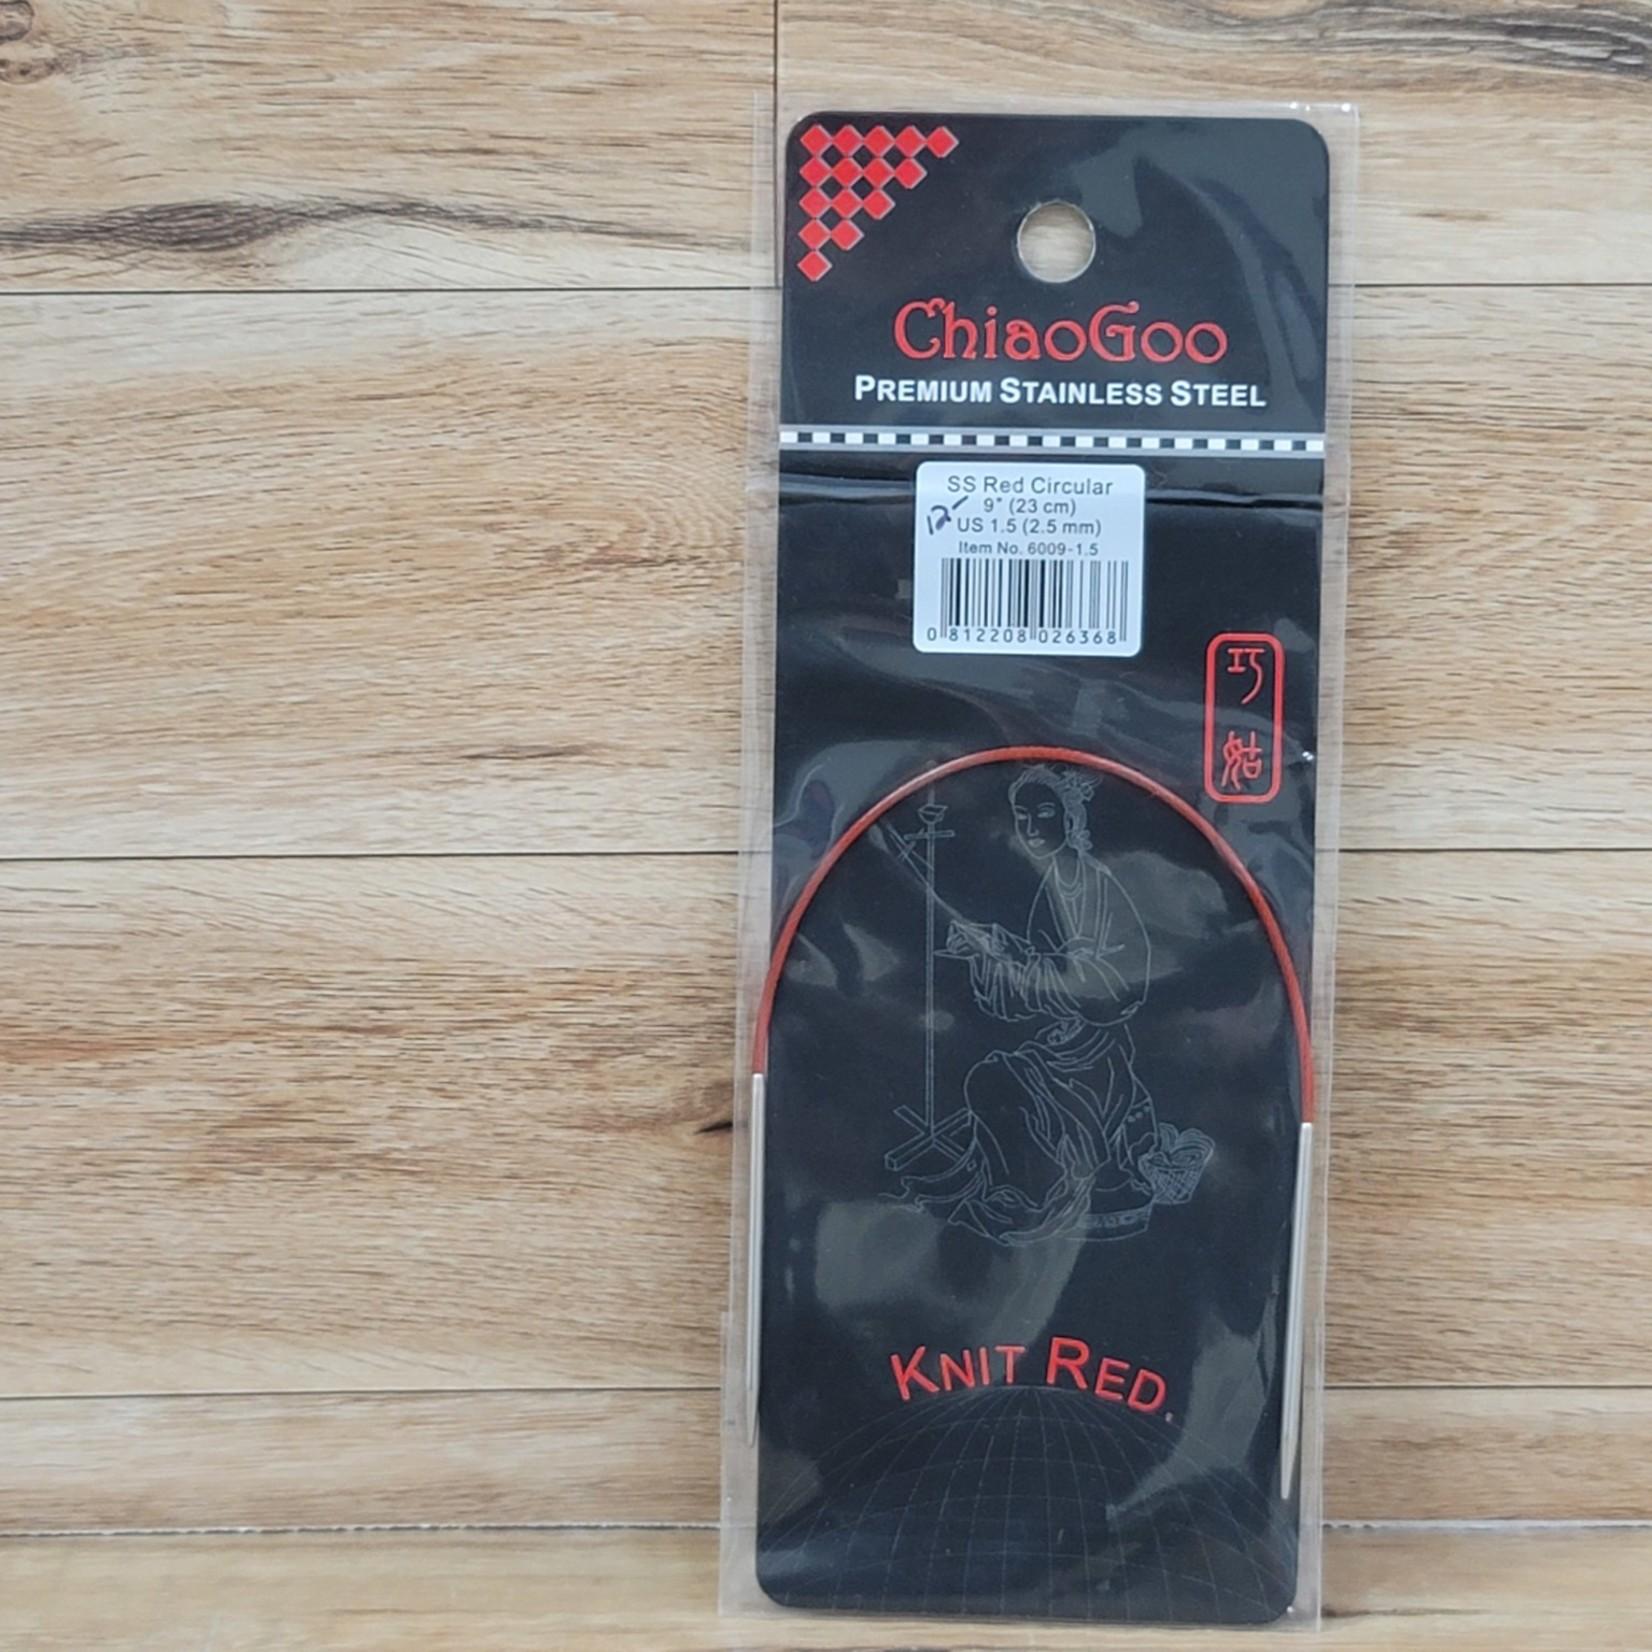 "ChiaoGoo - Red Circular Knitting Needles - 9"" (23cm) US 1.5 (2.5mm)"